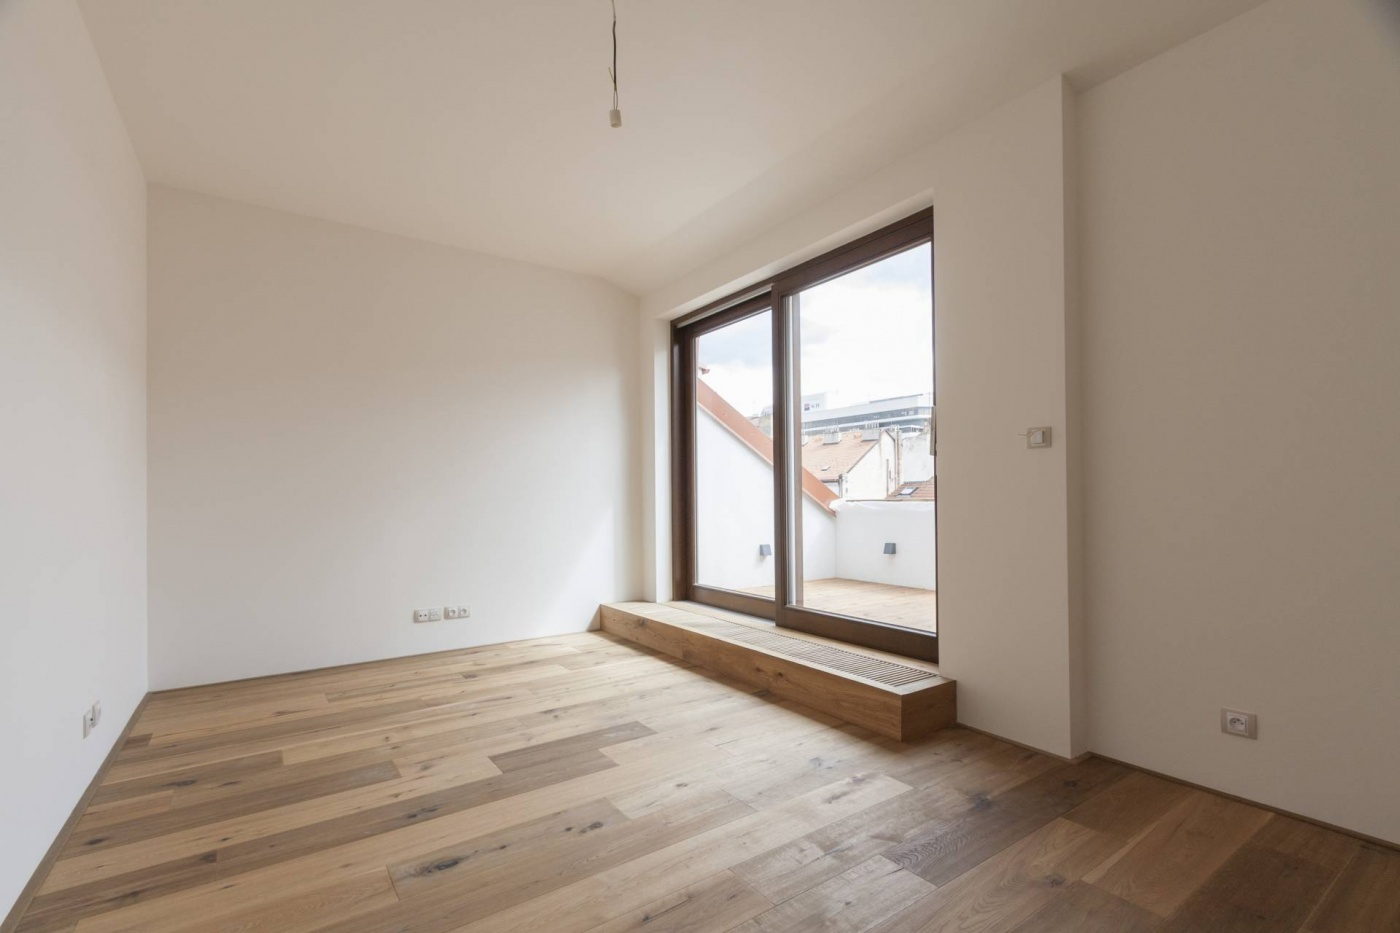 Půdní byt 3+kk, plocha 109 m², ulice Lumírova, Praha 2 - Vyšehrad | 18